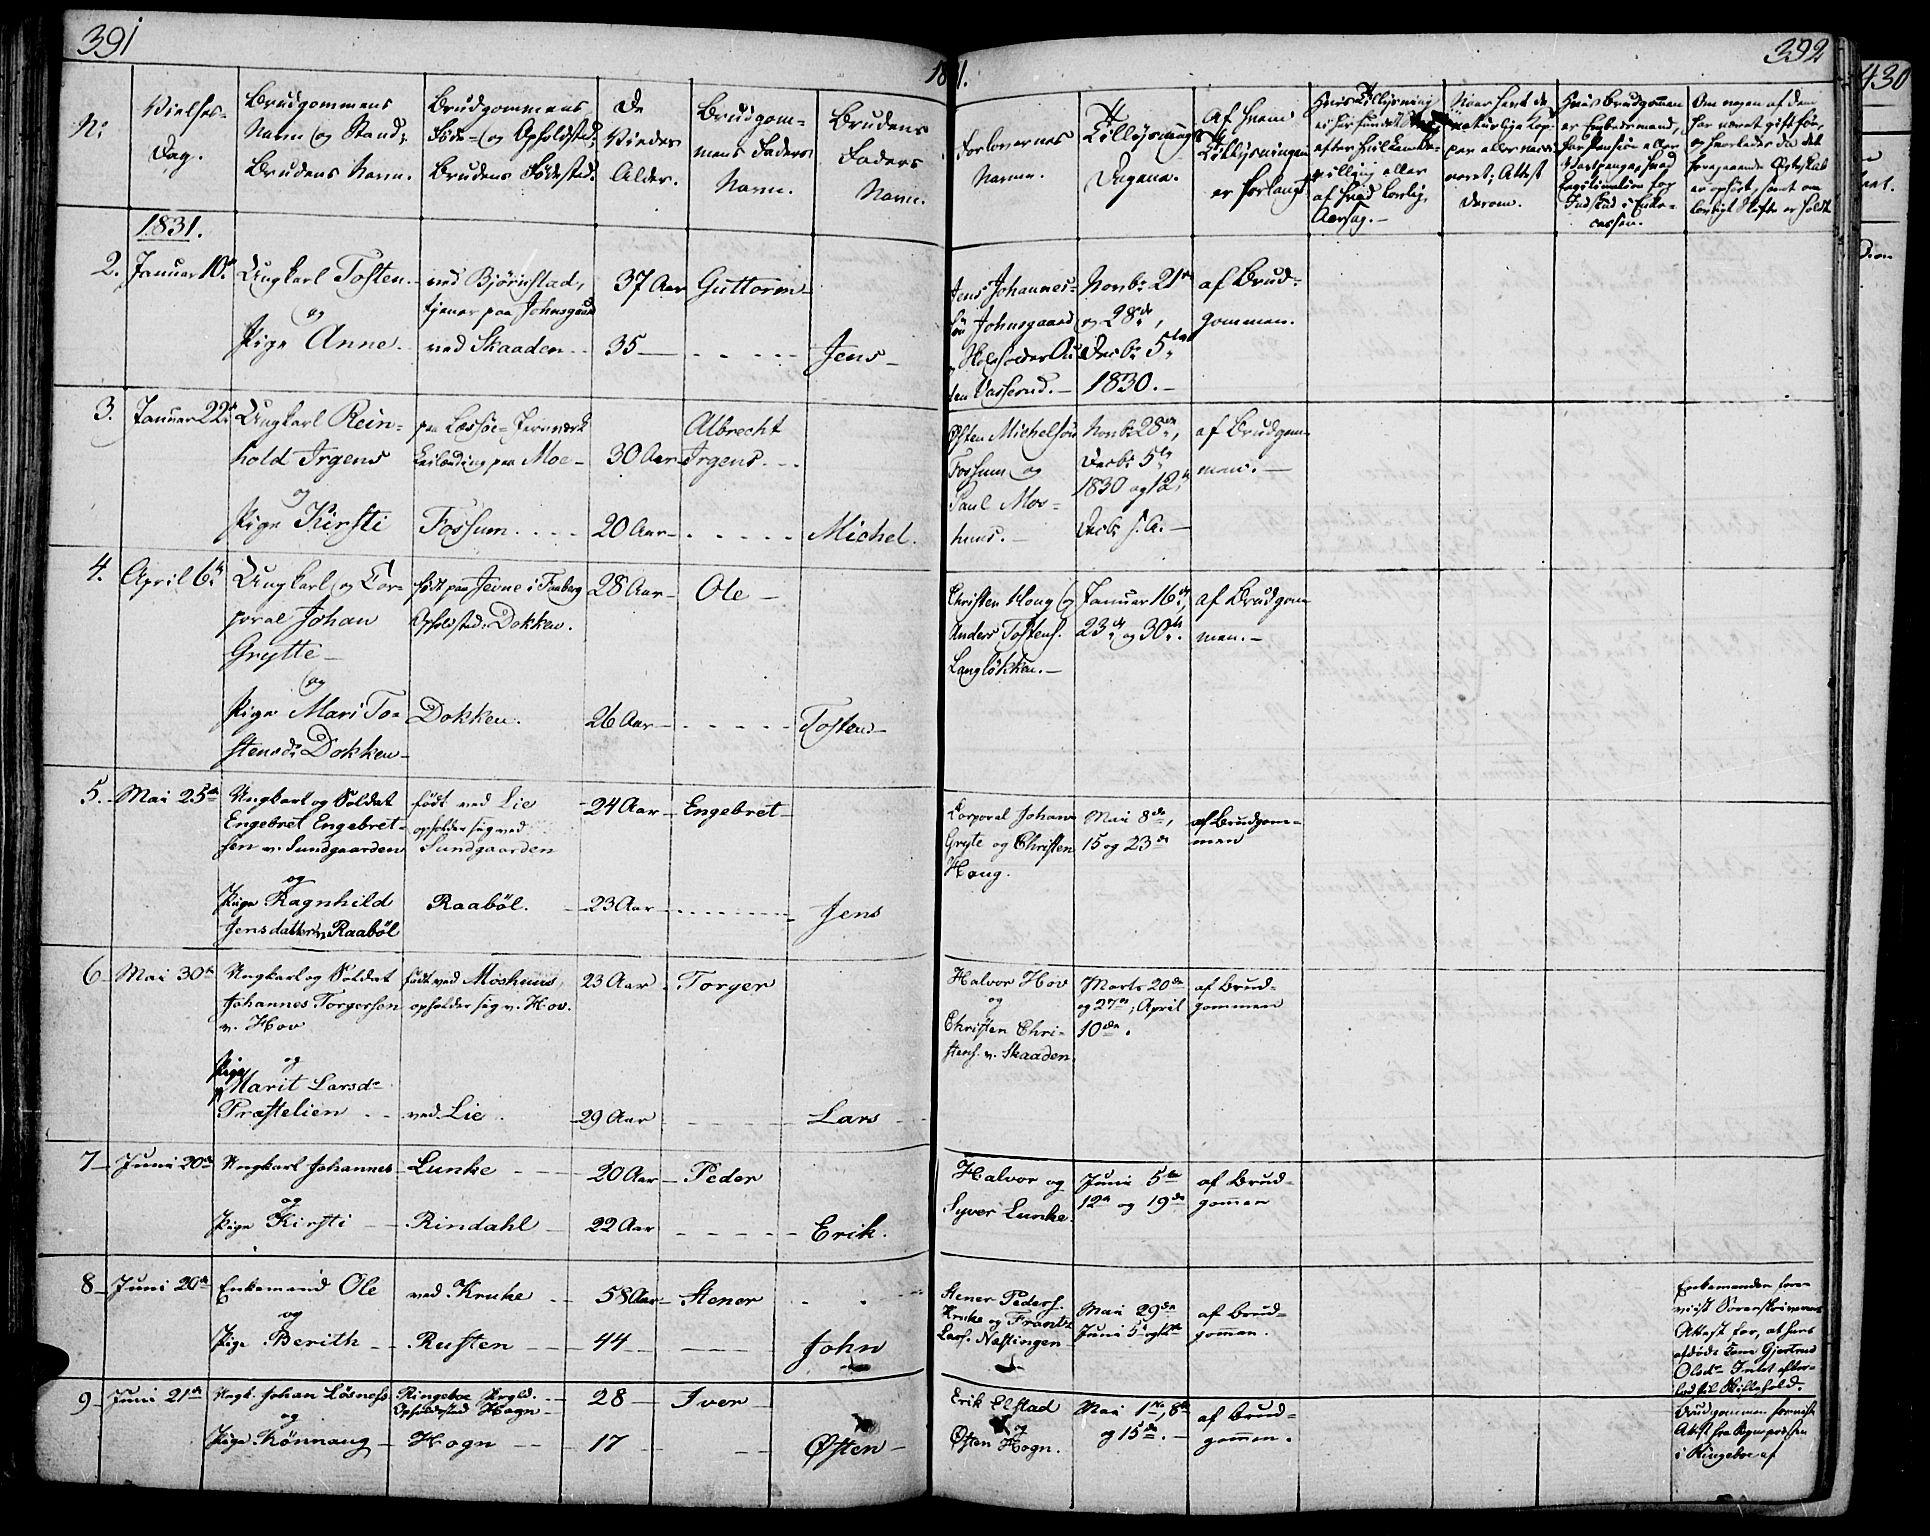 SAH, Øyer prestekontor, Ministerialbok nr. 4, 1824-1841, s. 391-392